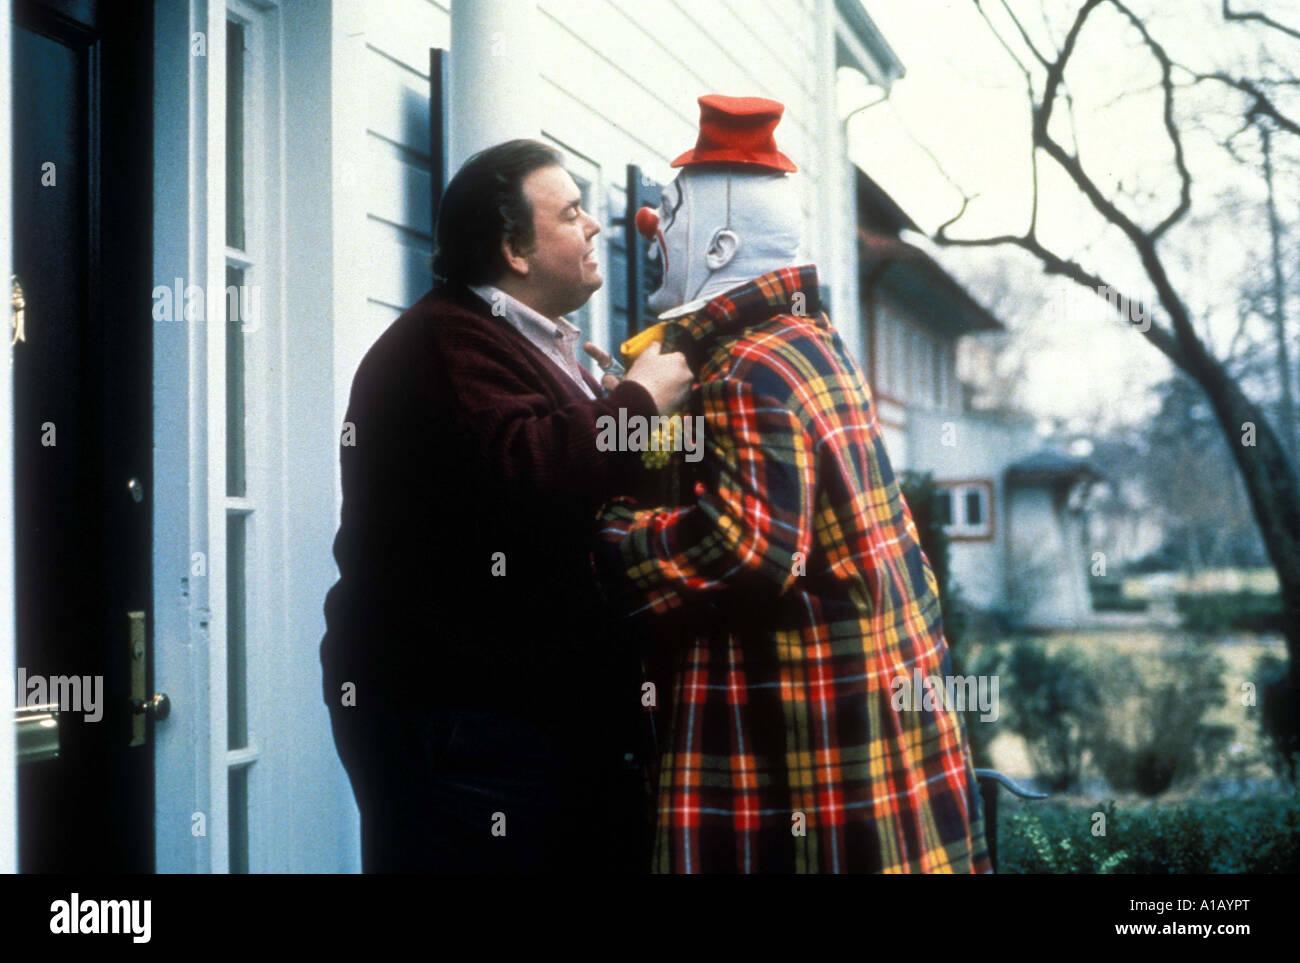 uncle buck year 1989 director john hughes john candy mike